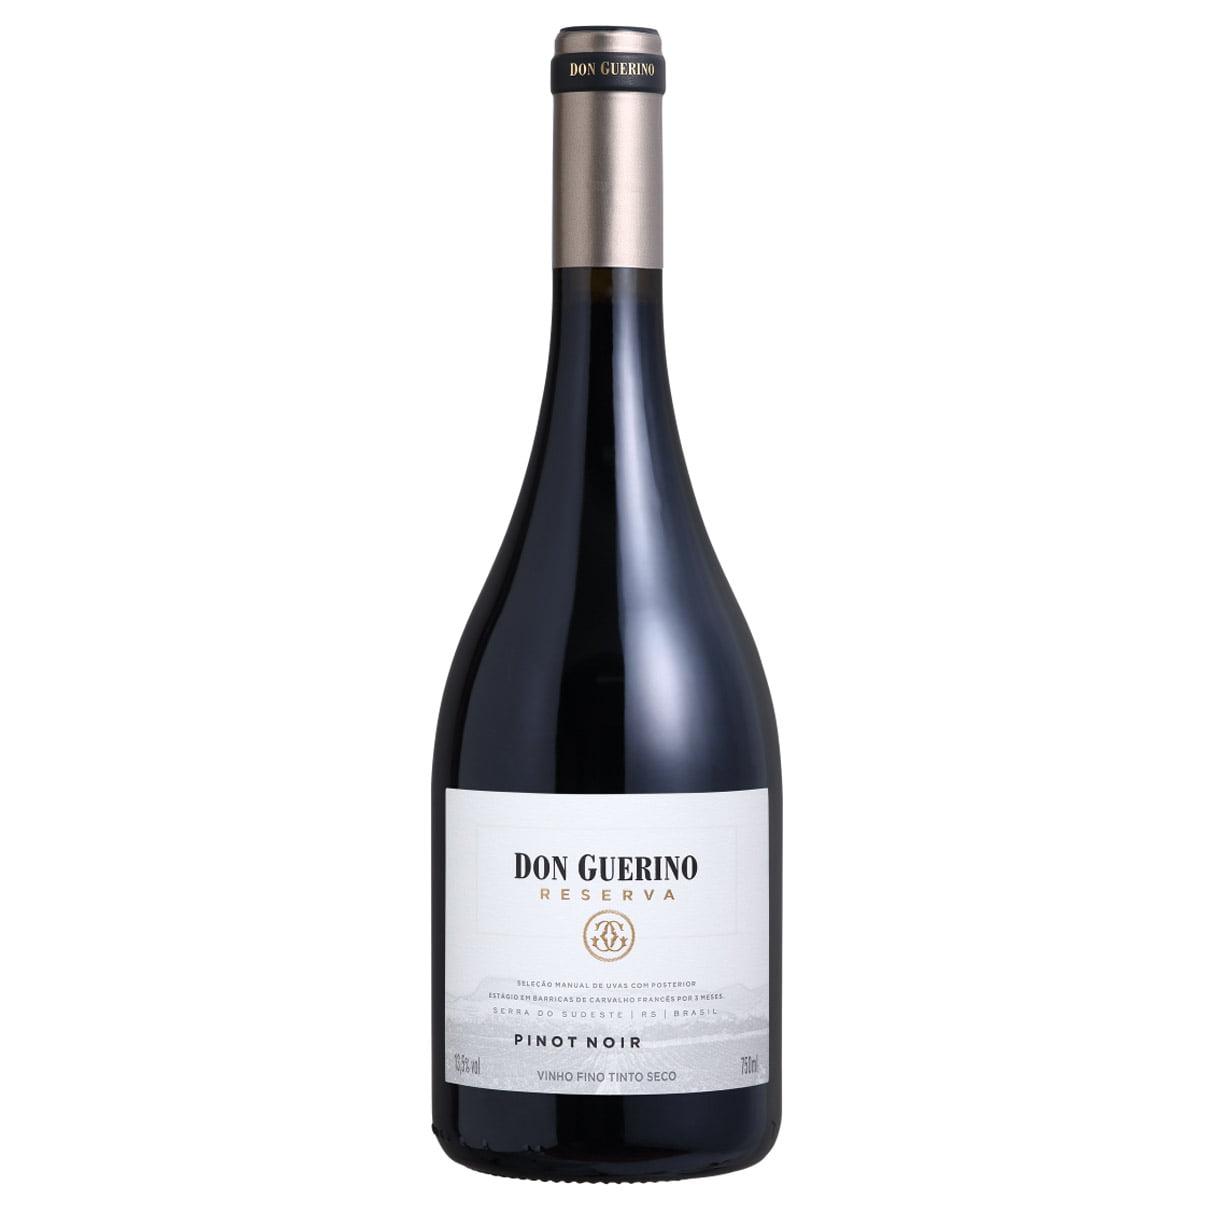 Don Guerino Reserva Pinot Noir 2020